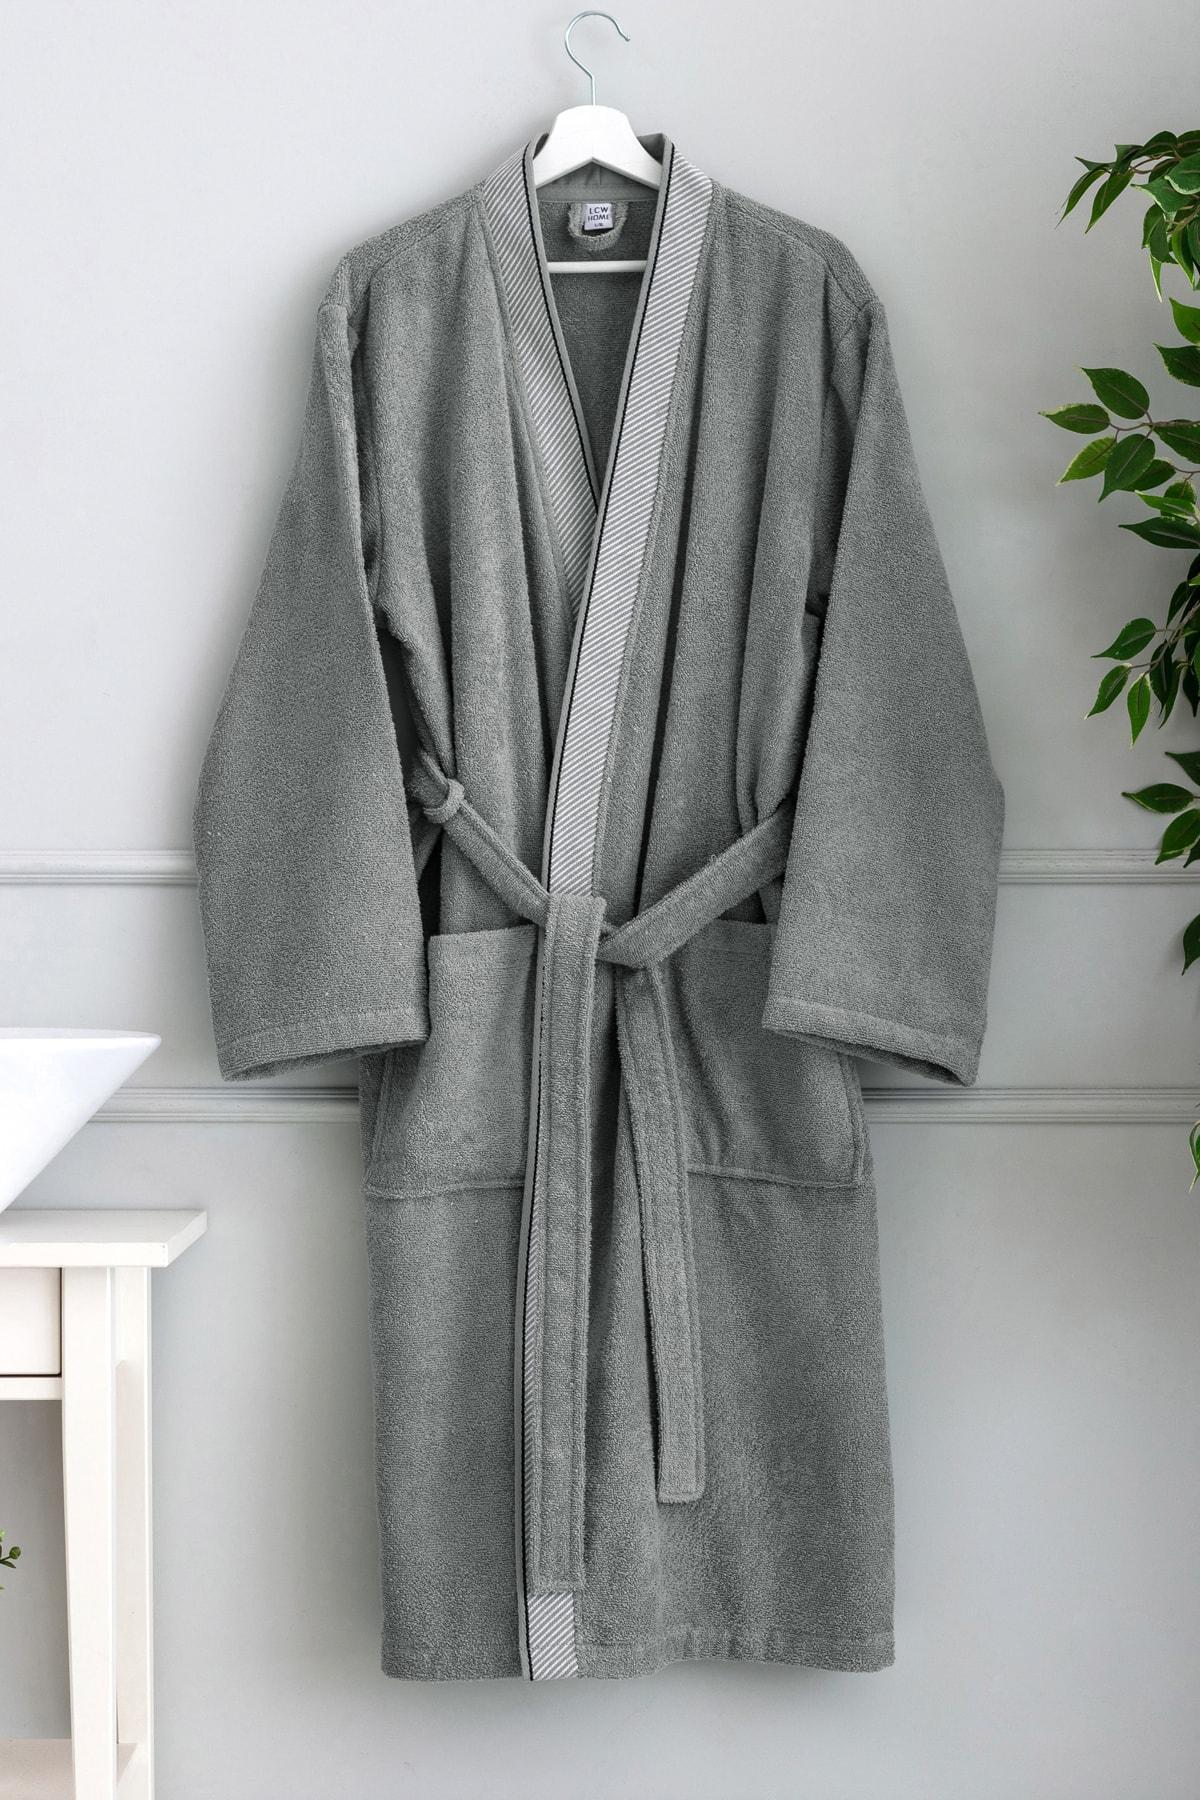 блуза lc waikiki lc waikiki mp002xw1csvu Lc Waikiki Robe Gray Color Men 'S Clothing bathing suits cotton production with pockets robe free shipping